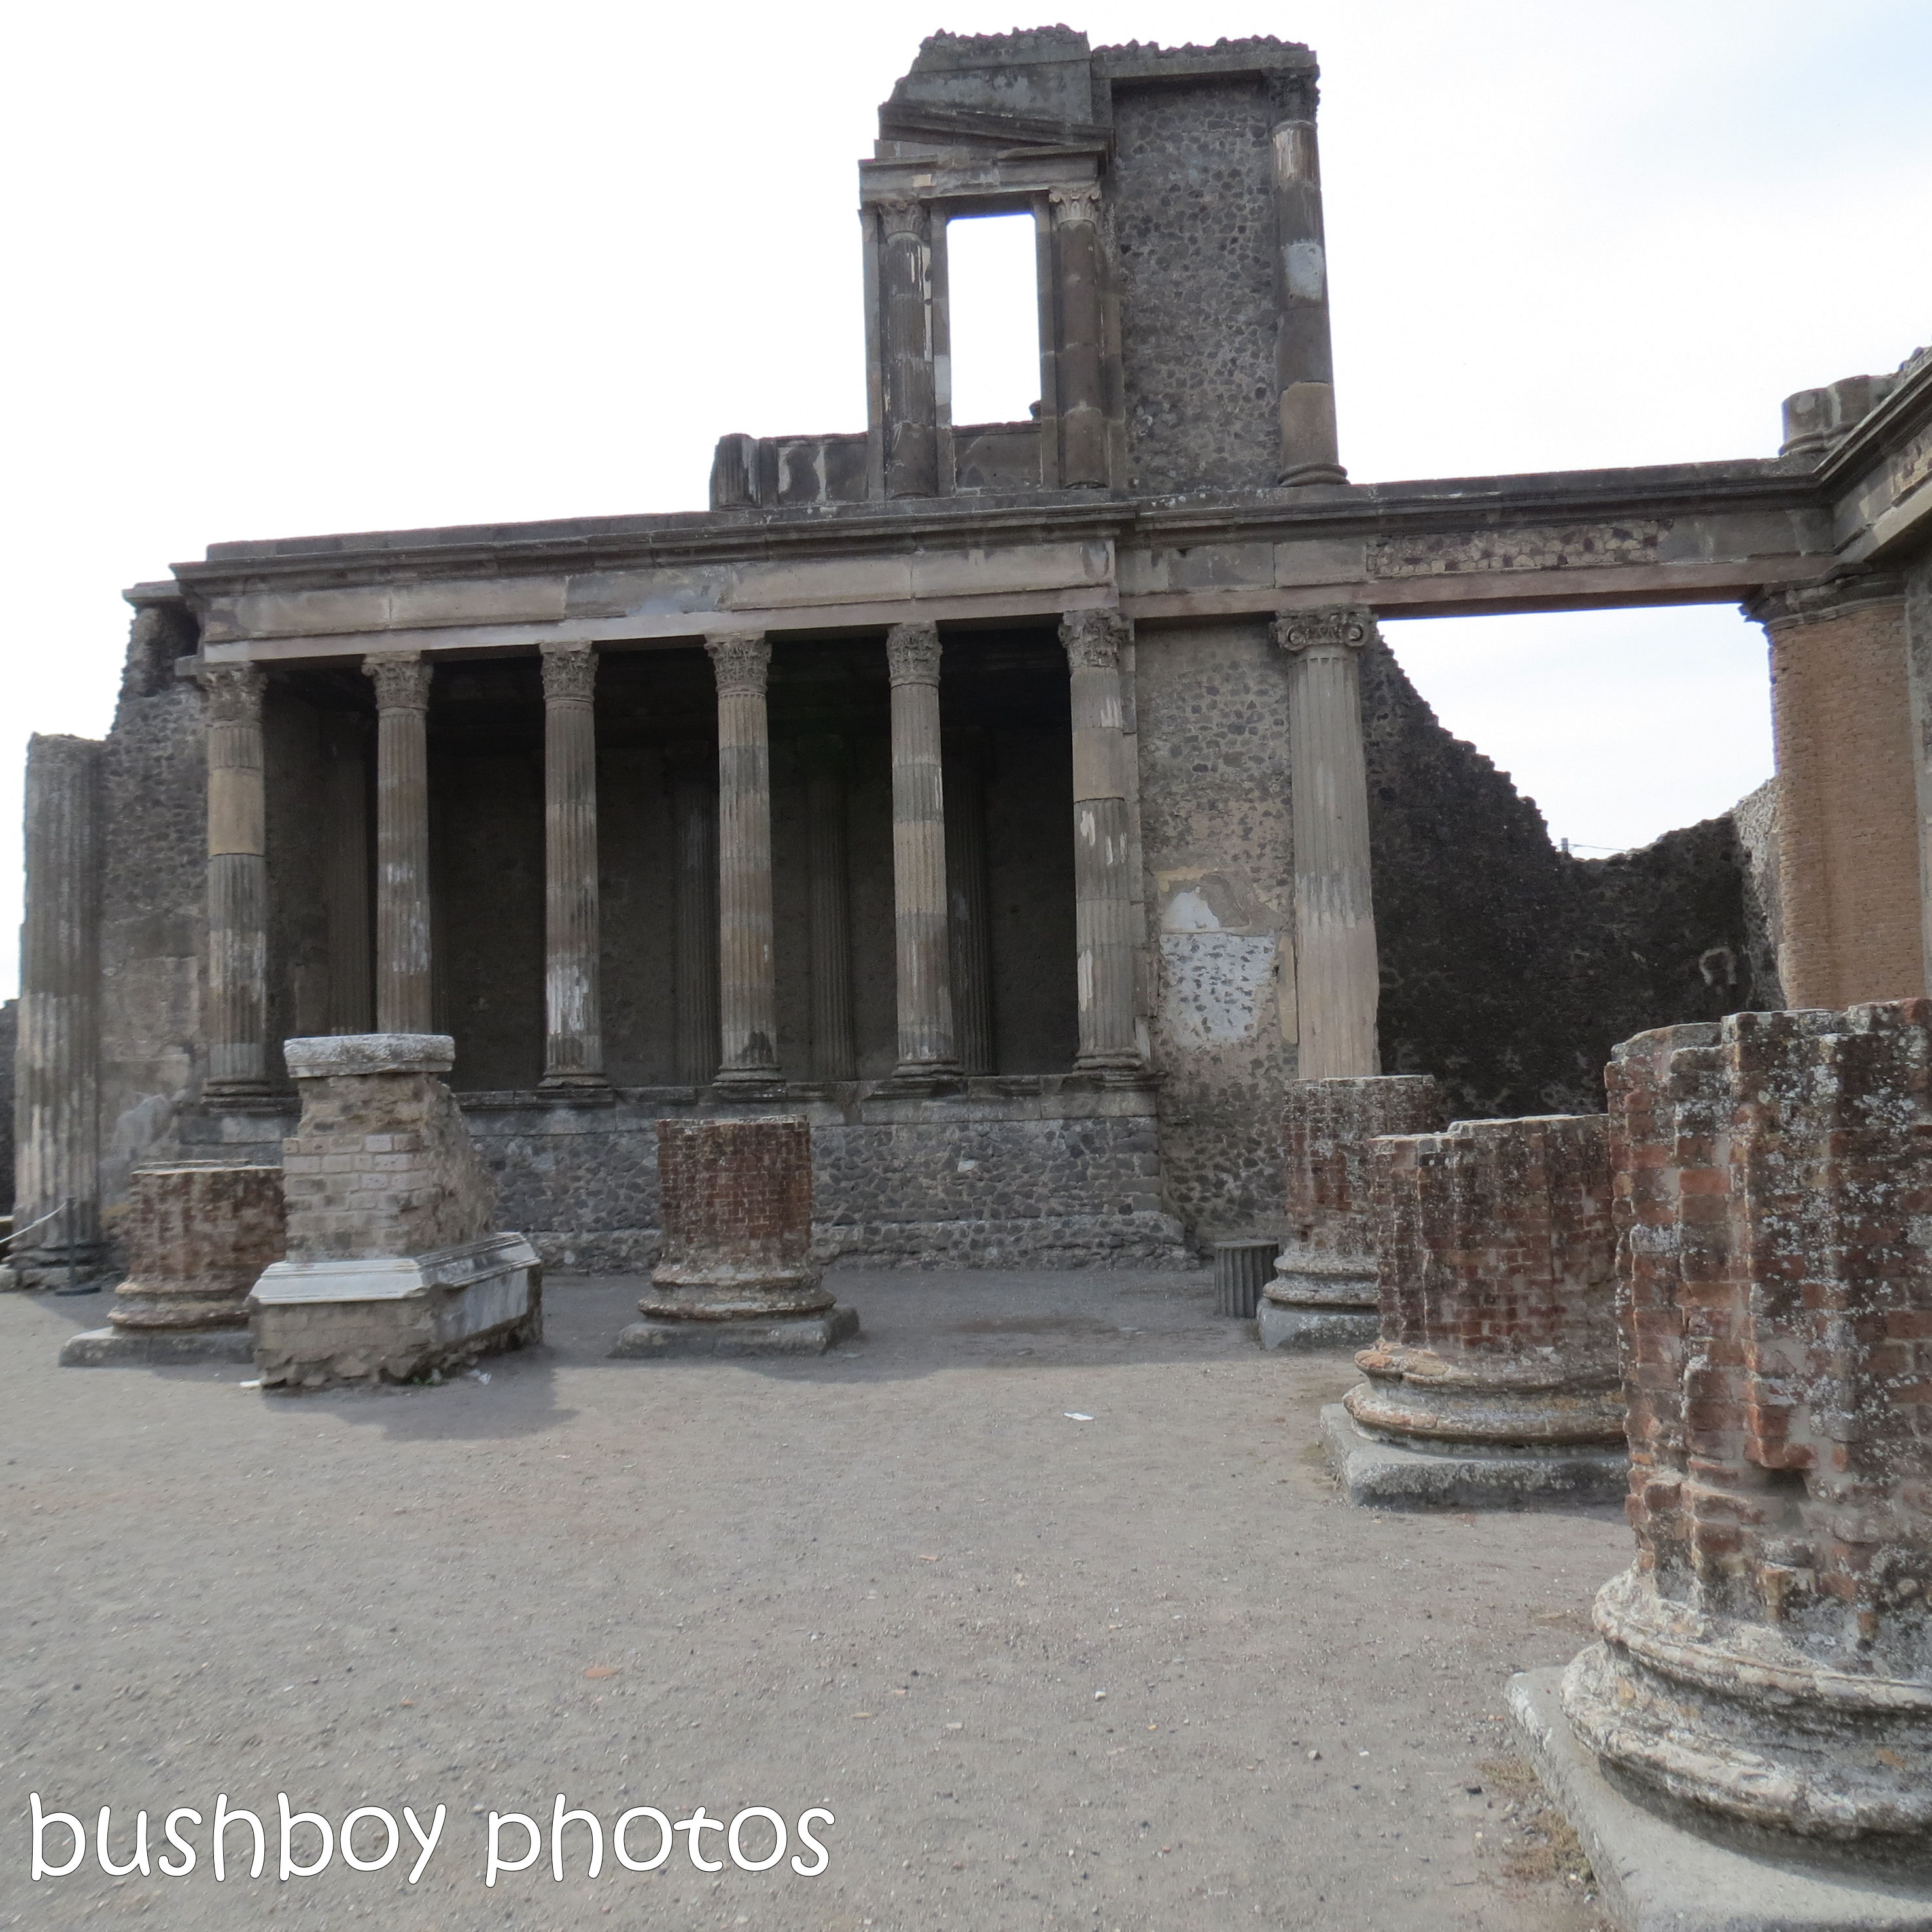 181213_time_square_pompeii_turn_back_time